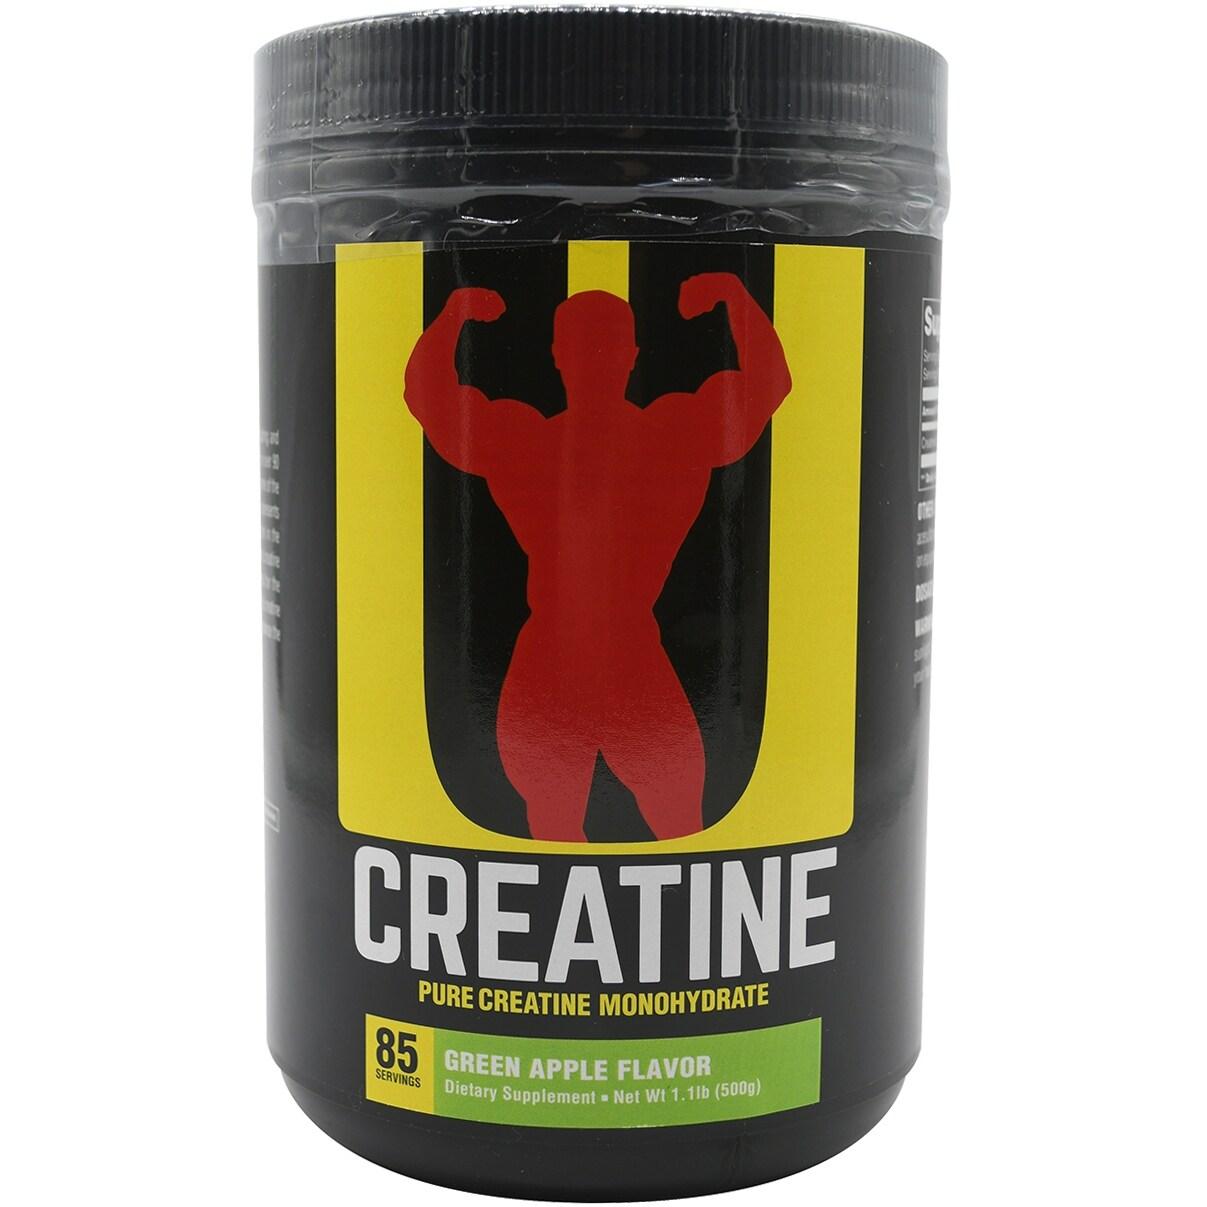 Shop Universal Nutrition Creatine Powder Supplement 85 Servings Green Apple 85 Servings Overstock 31107220